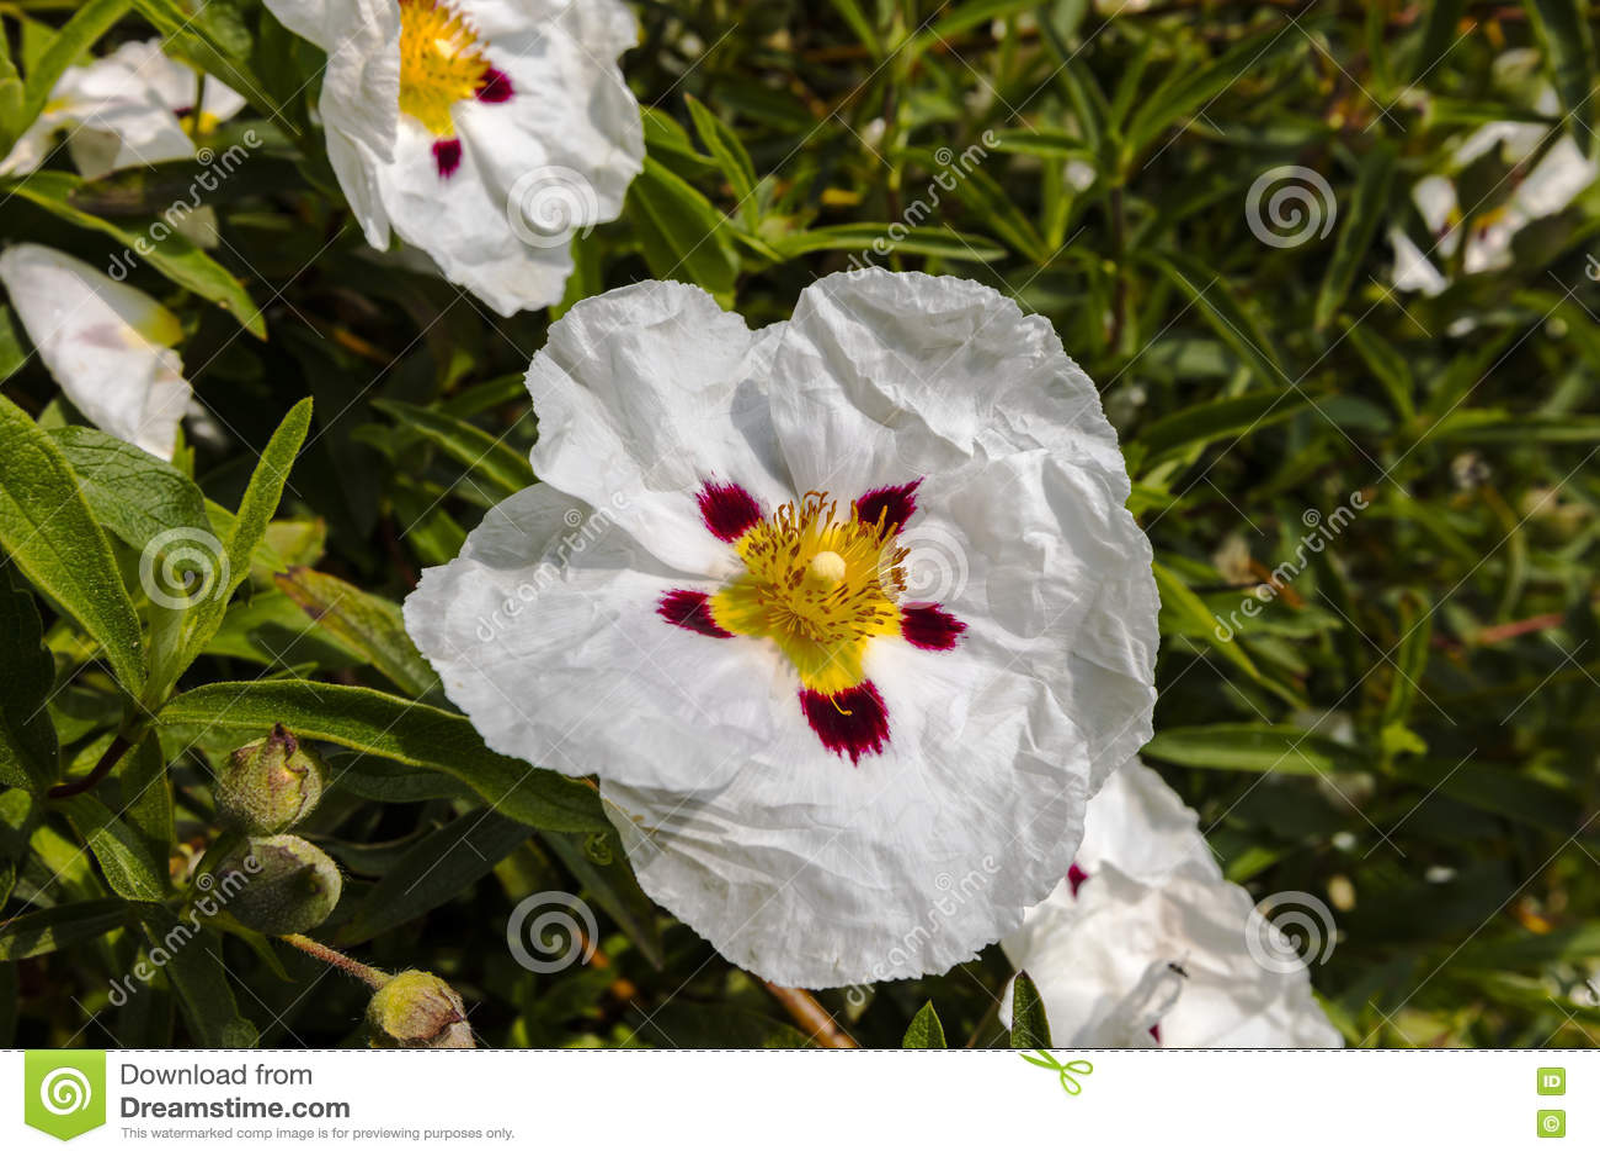 Cistus Decorative Flowering Shrub With White Flowers Stock Photo